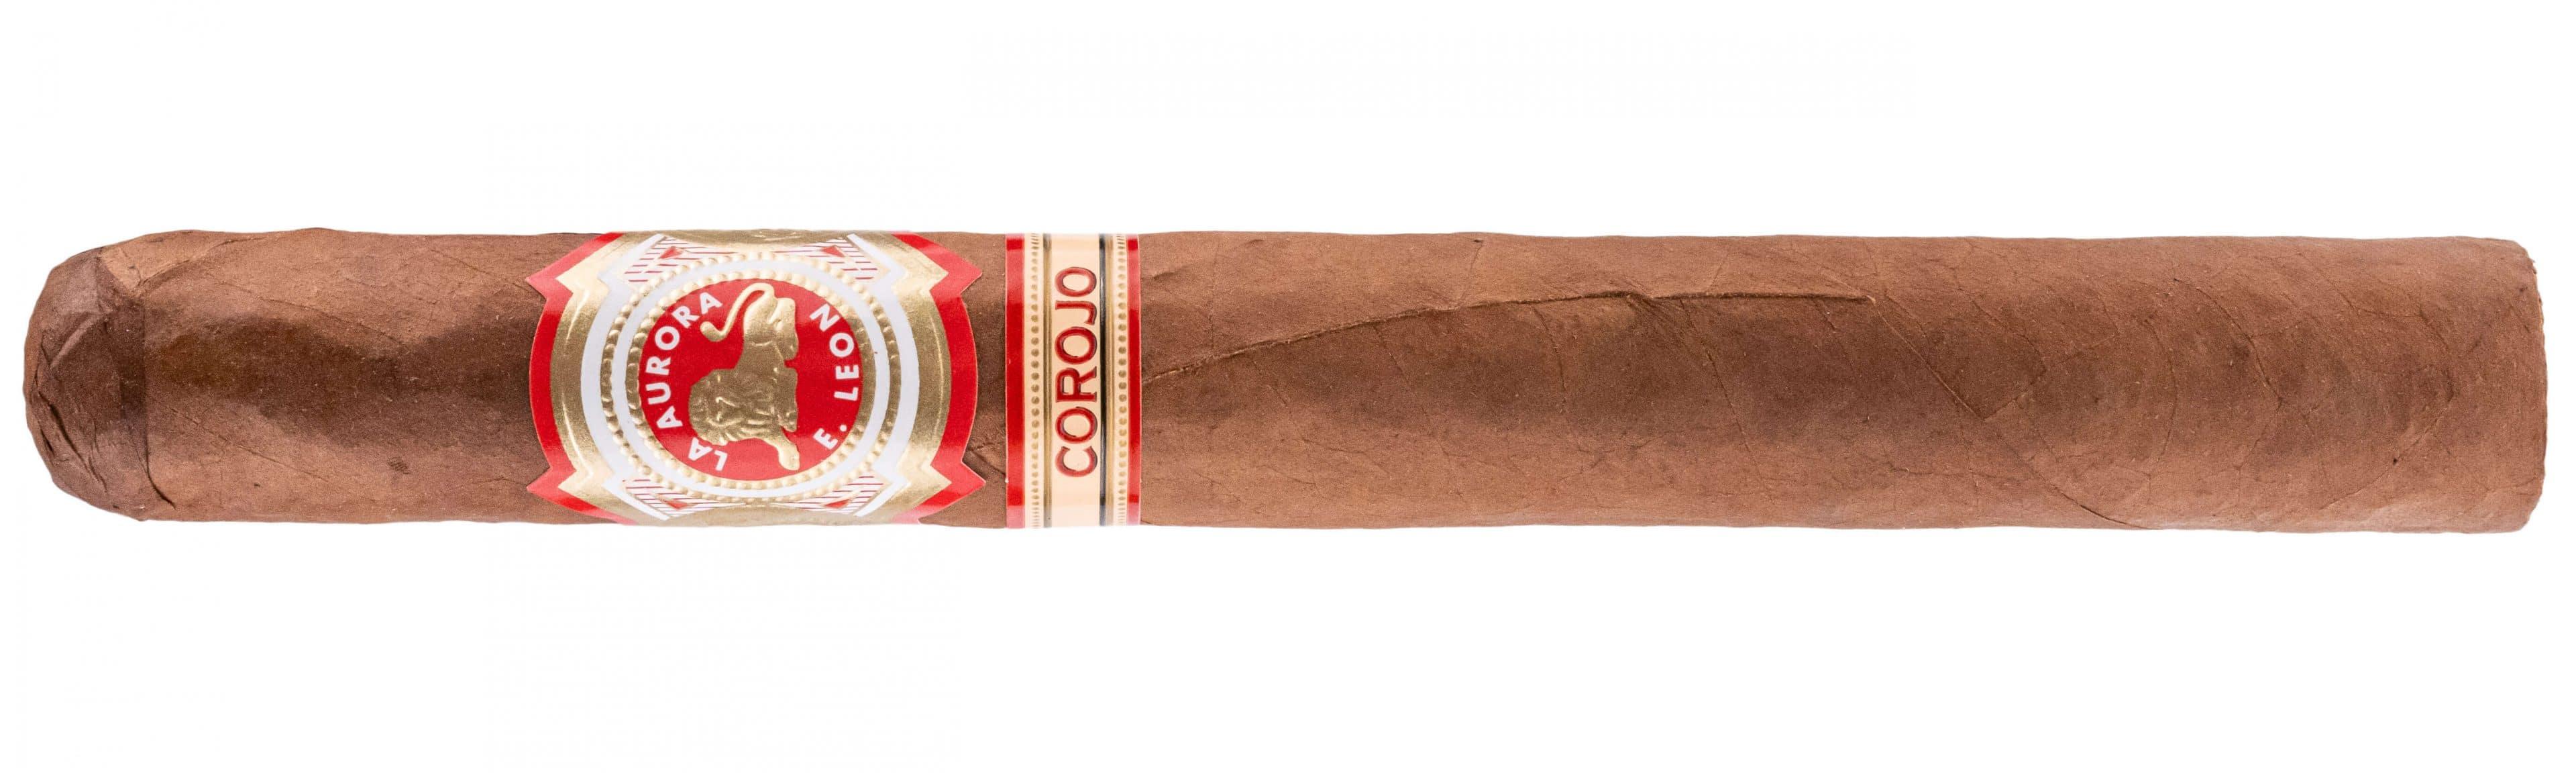 Blind Cigar Review: La Aurora   Embassador Habana Corojo Corona Gorda